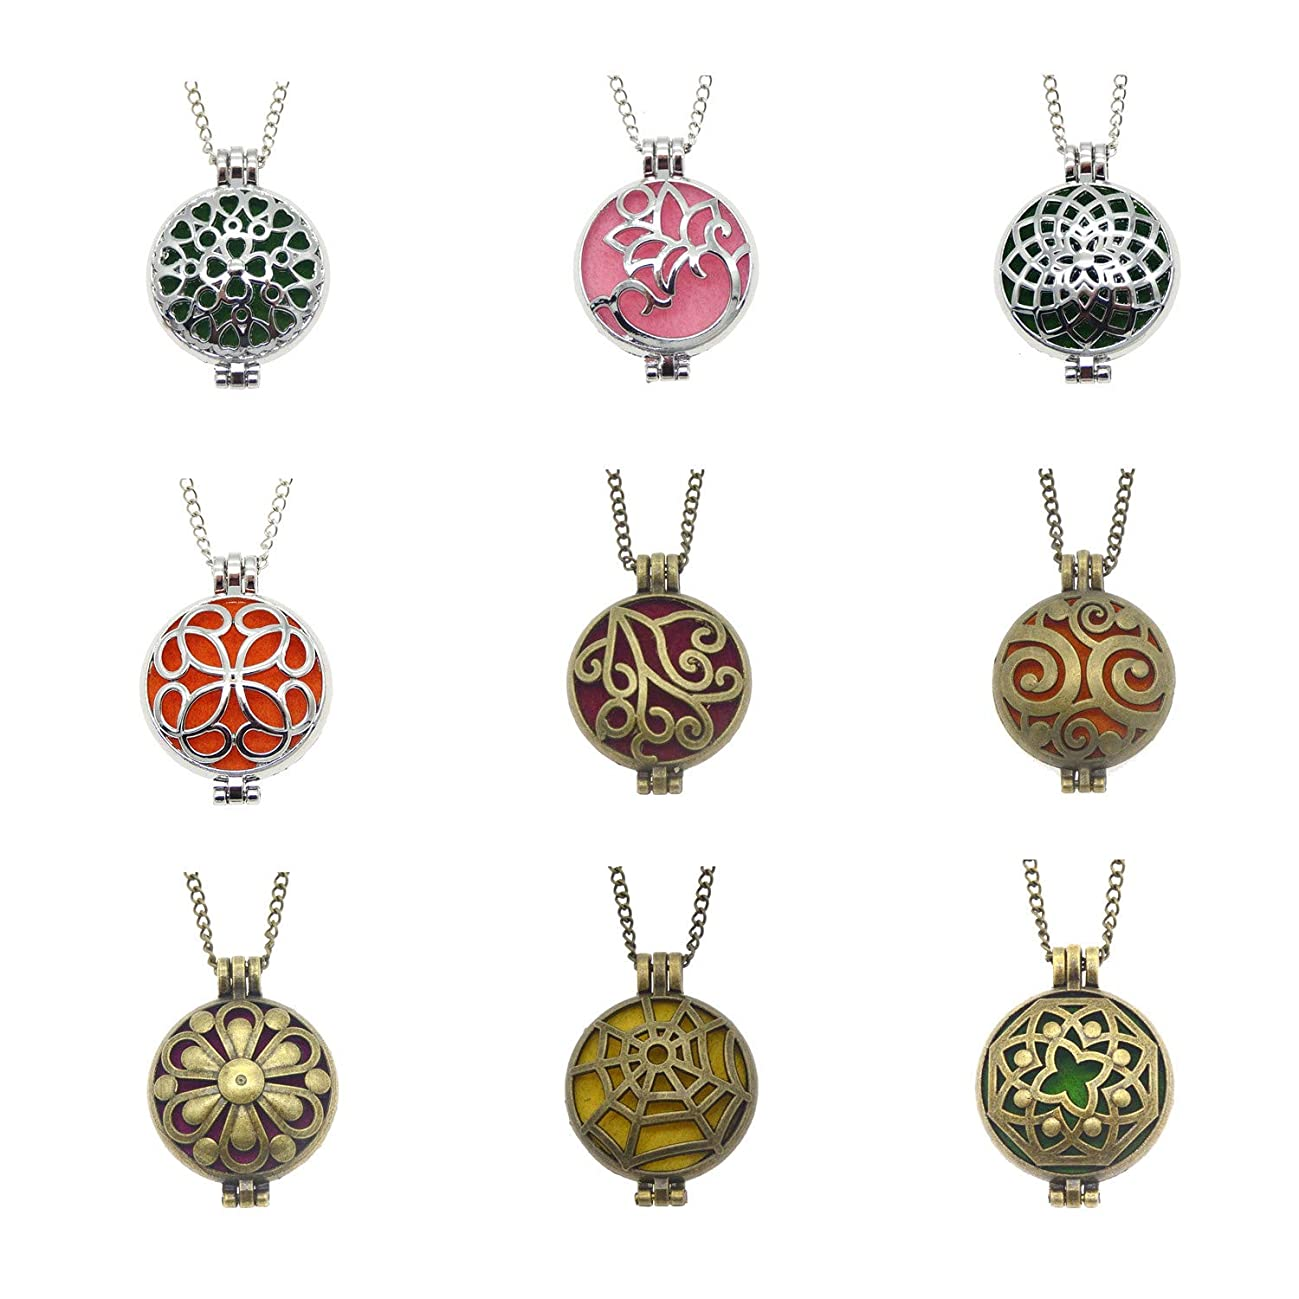 Julie Wang Bulk Sale 9pcs Aromatherapy Enssential Oil Diffuser Necklace Round Locket Pendants Gift